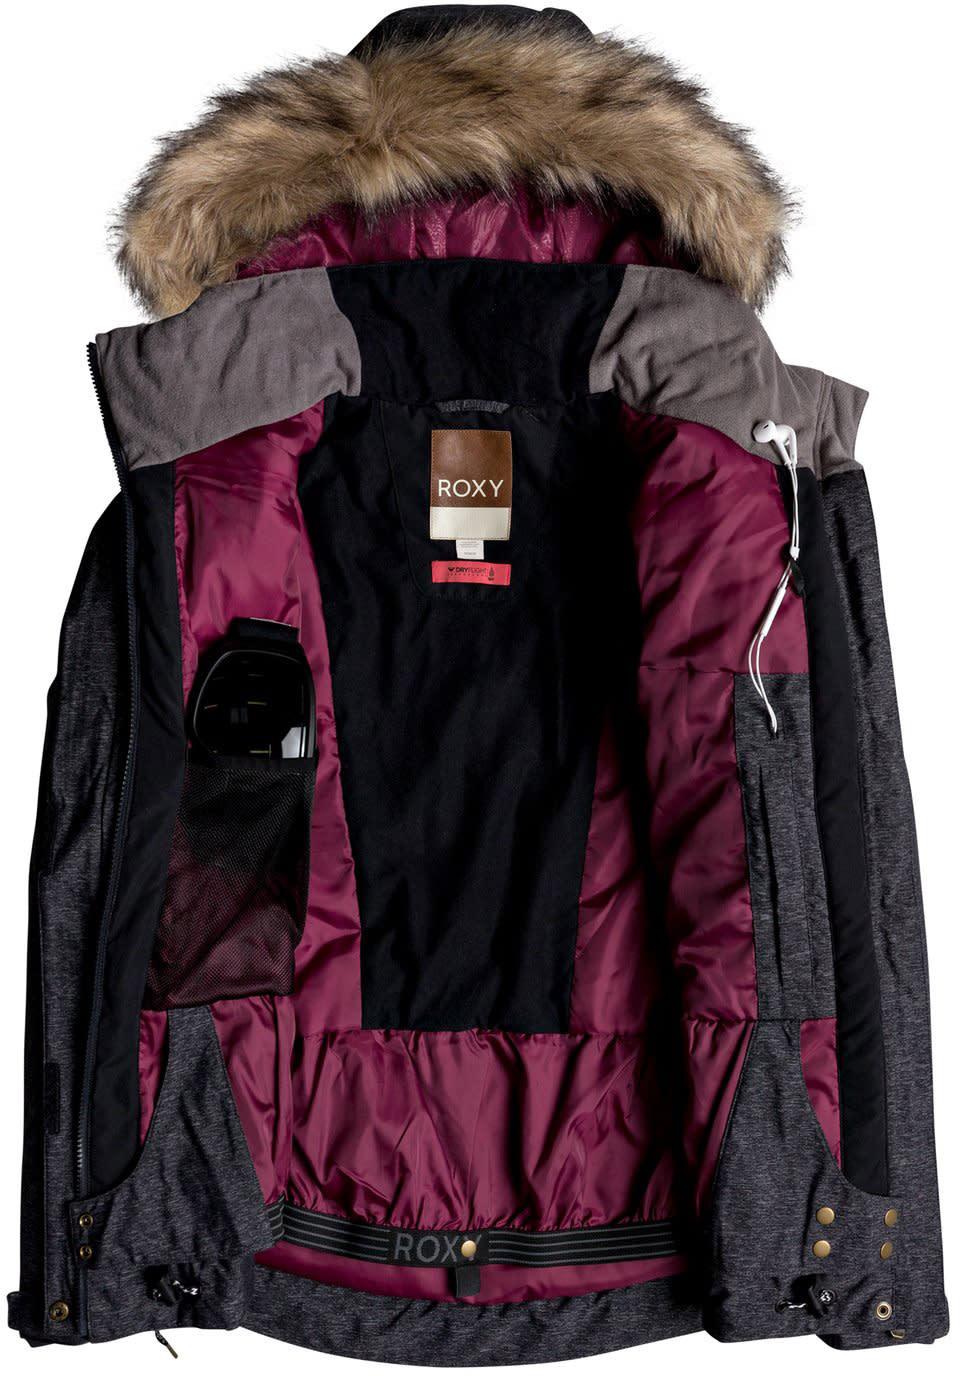 Roxy Women's Meade Snow Jacket, Coral Cloud   Roxy ski